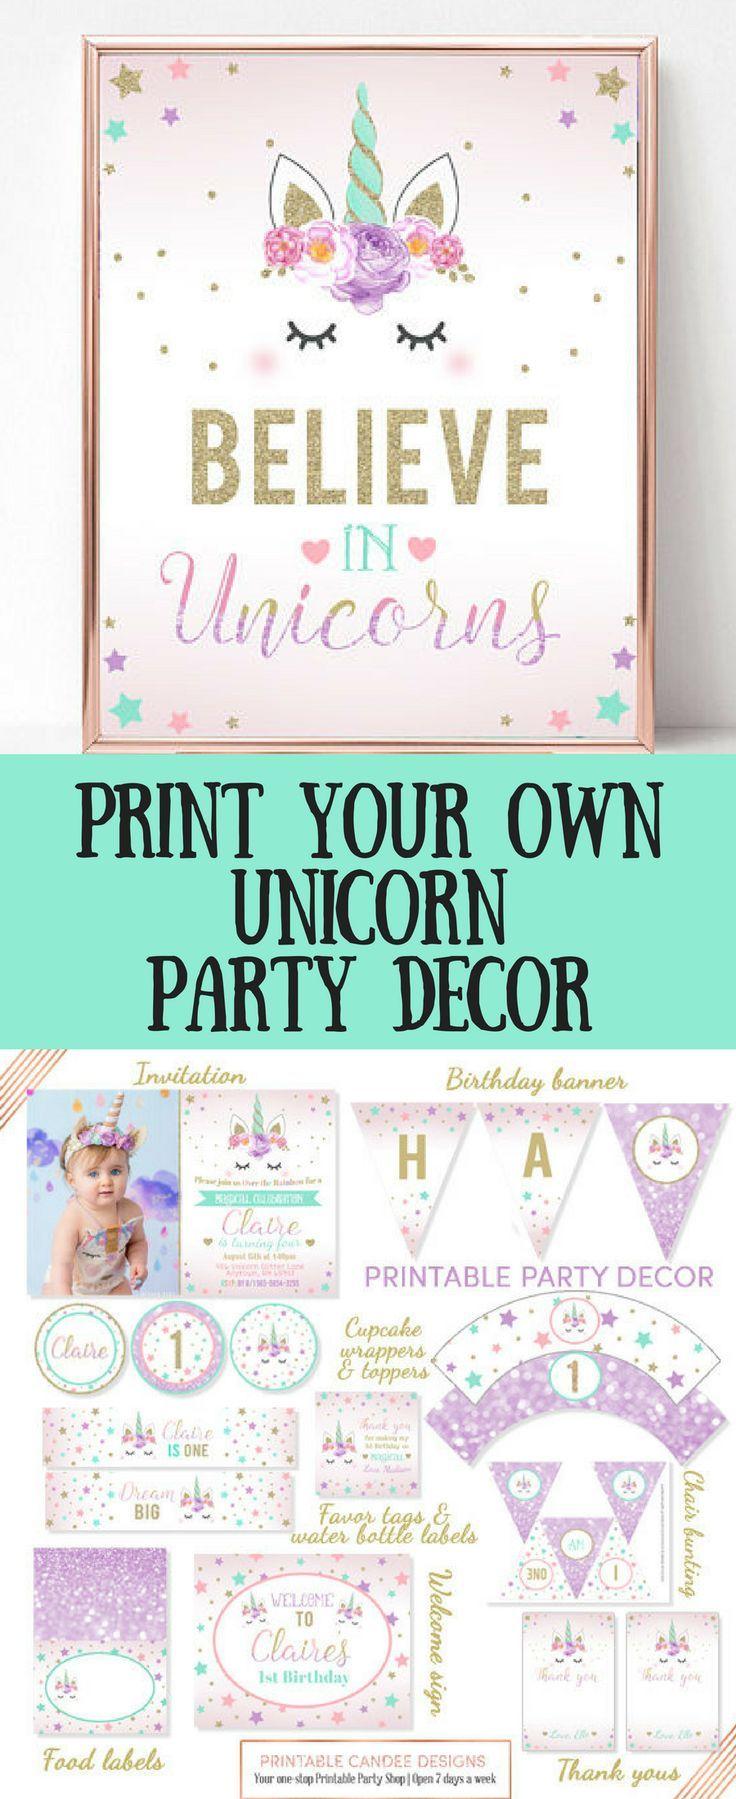 Printable unicorn party decor kit, editable at home. Banners ...